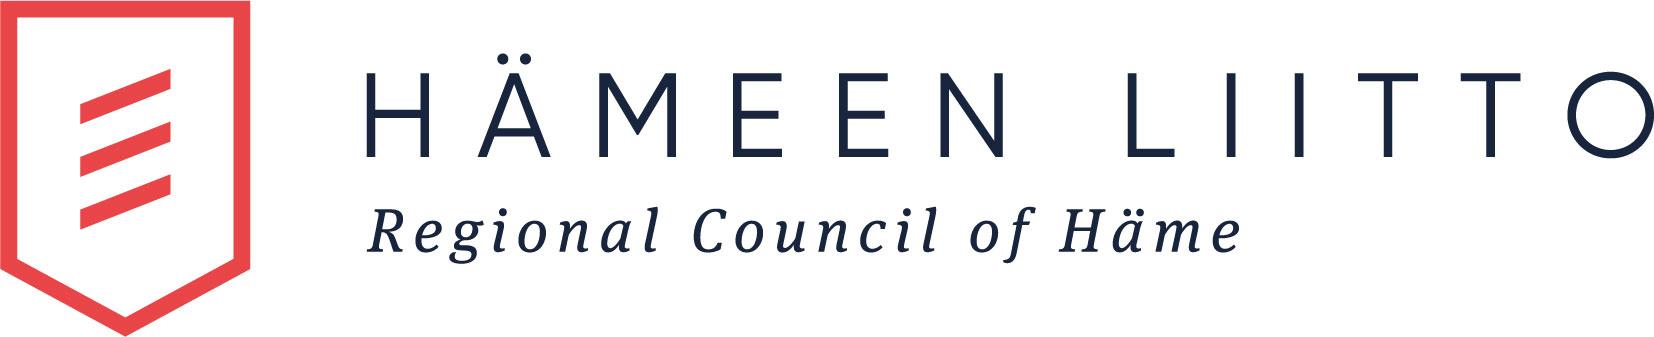 Regional Council of Häme logo